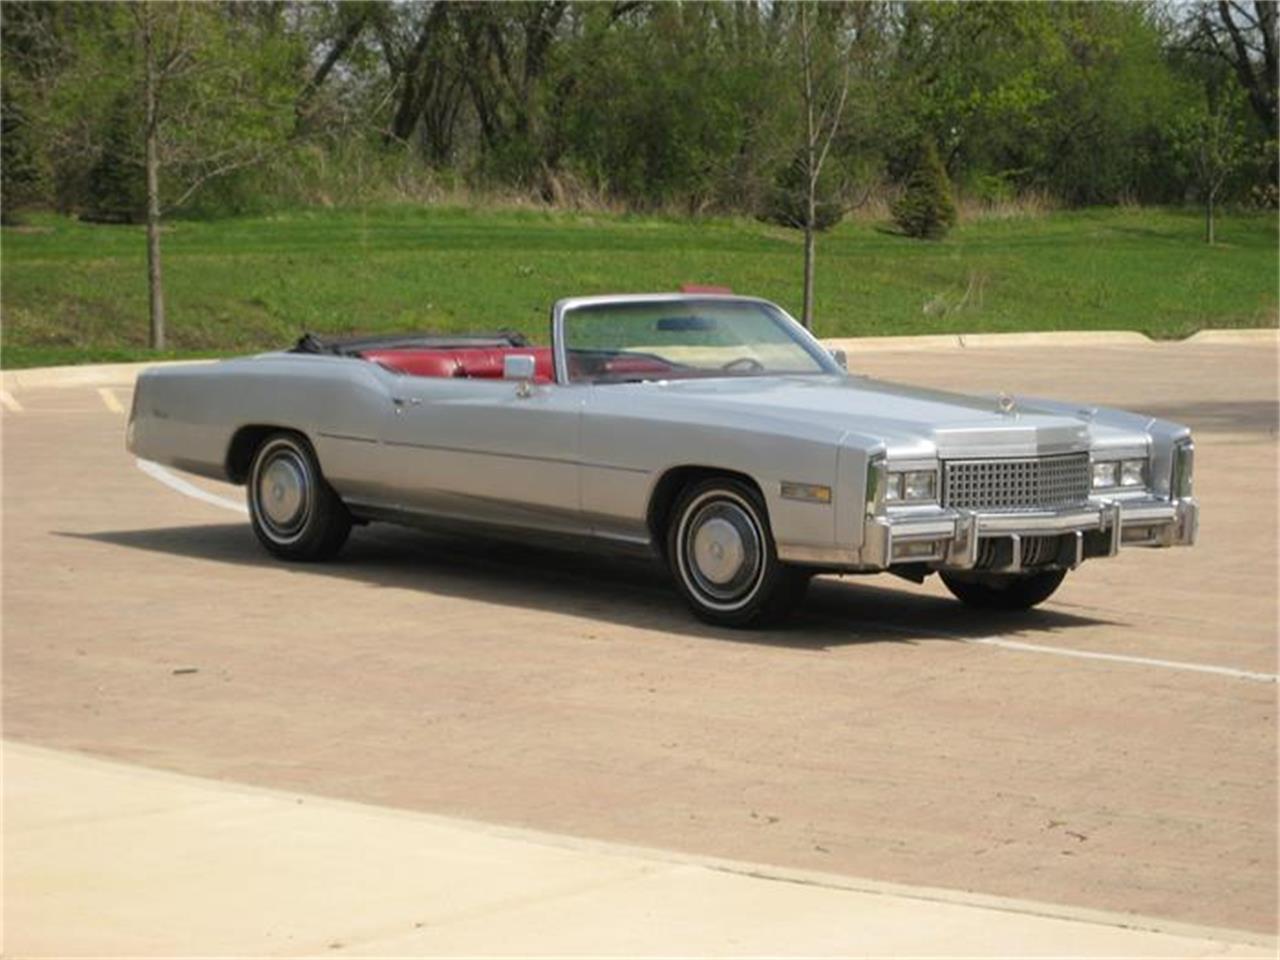 Large Picture of '75 Cadillac Eldorado located in Geneva Illinois - $12,995.00 - E9SK